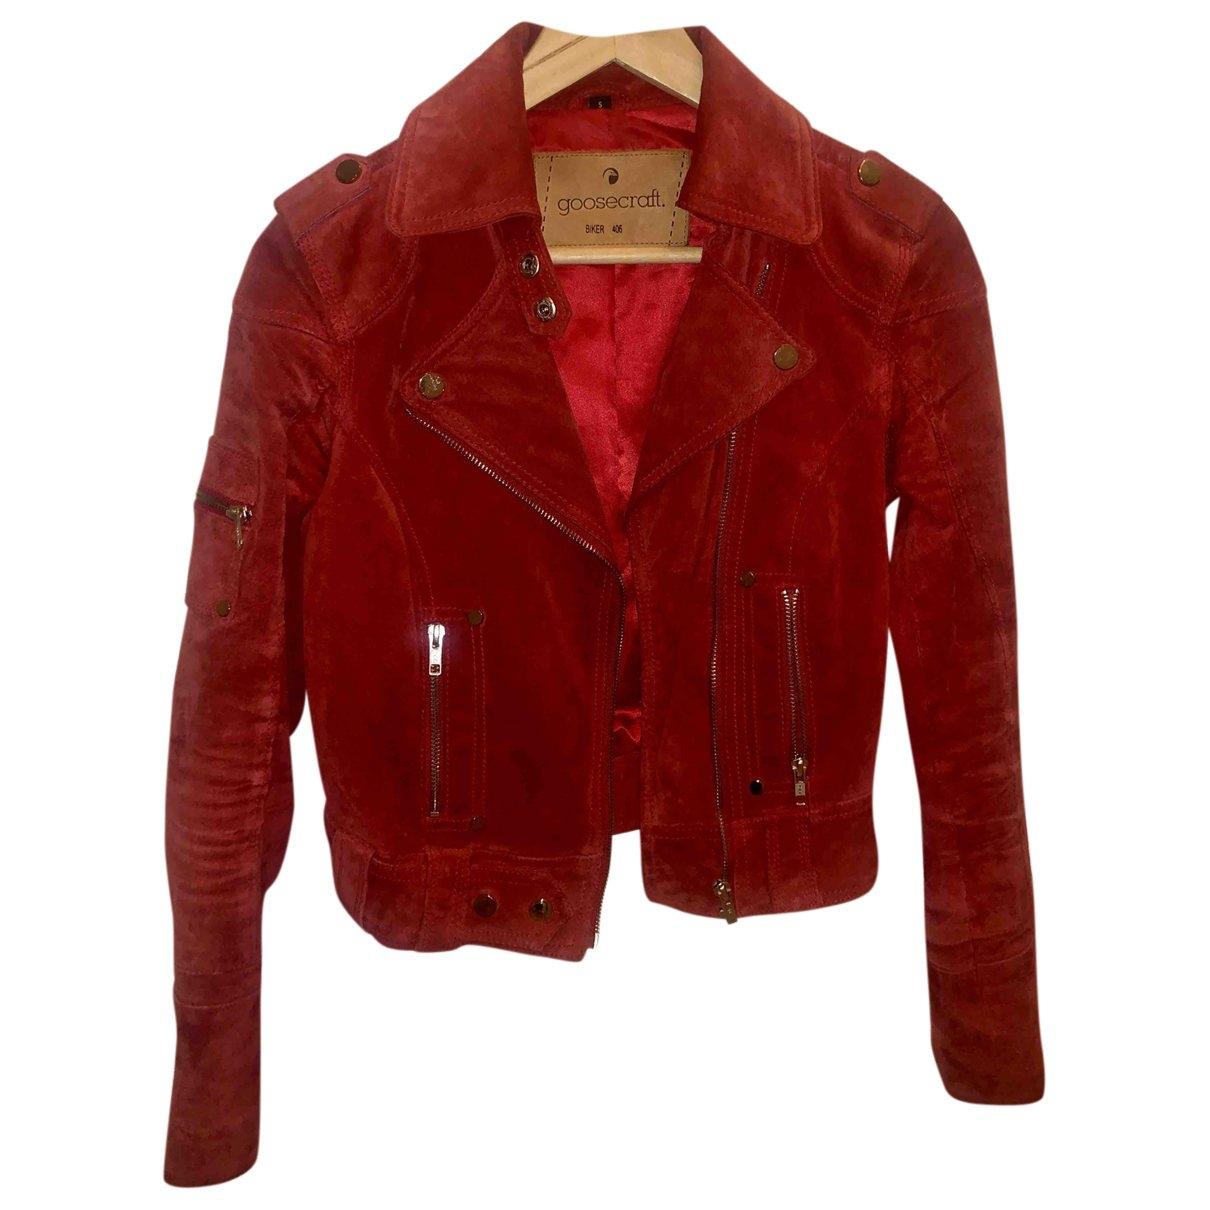 Goosecraft - Veste   pour femme en suede - rouge